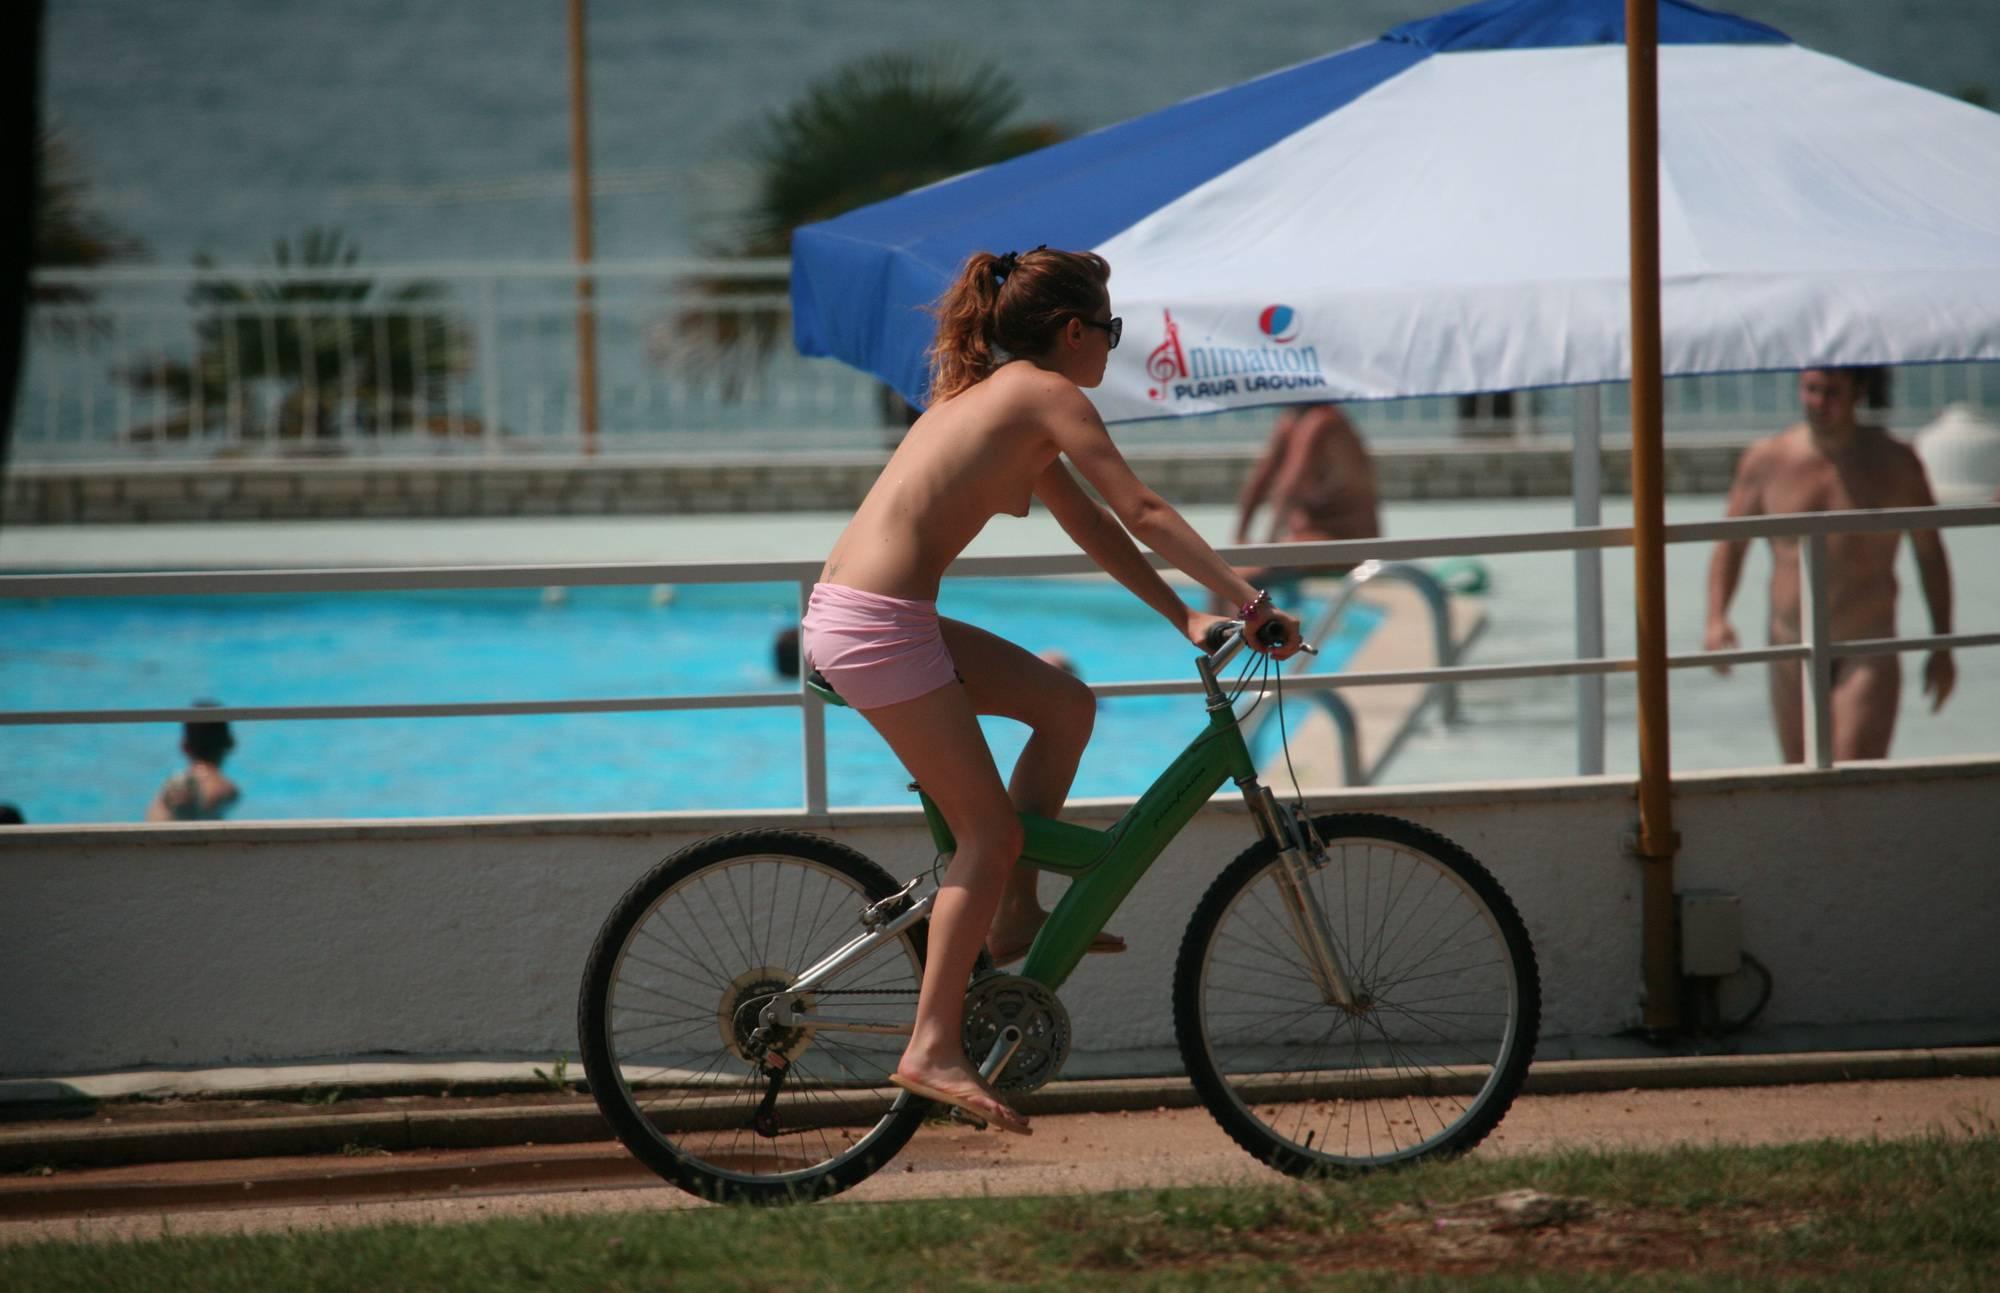 Purenudism-Naturist Poolside Biking - 1